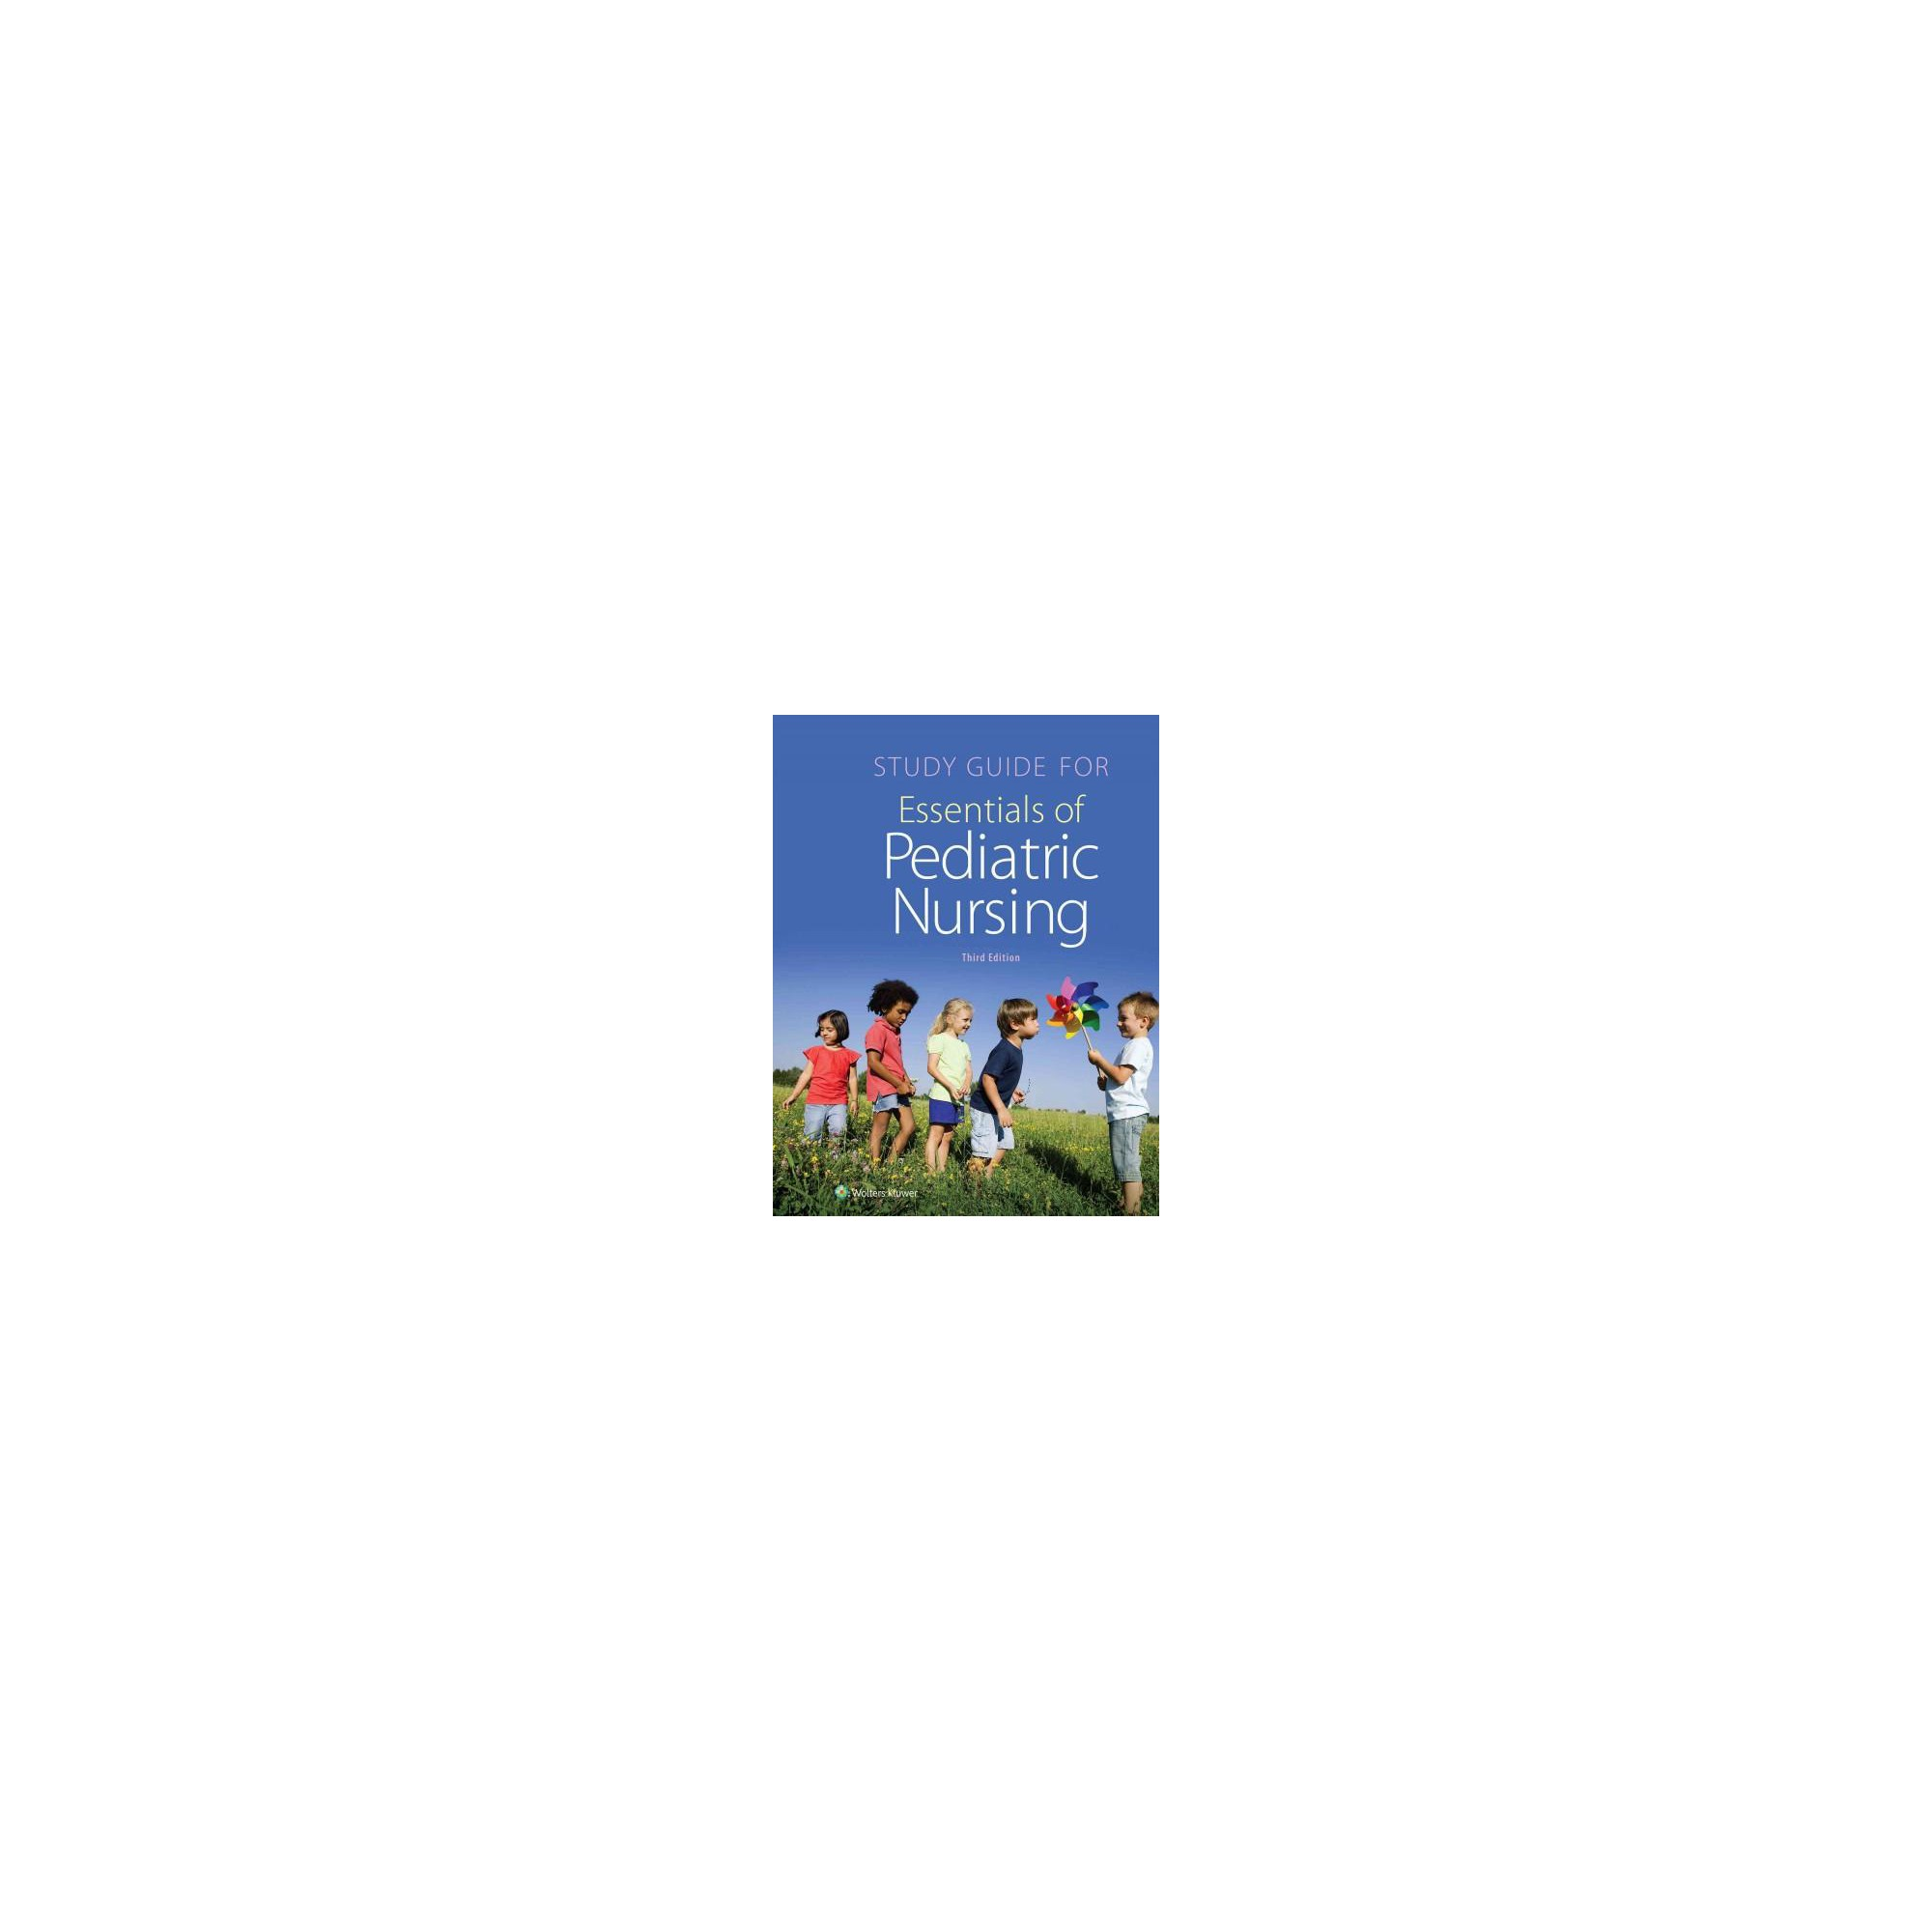 Essentials of Pediatric Nursing (Study Guide) (Paperback